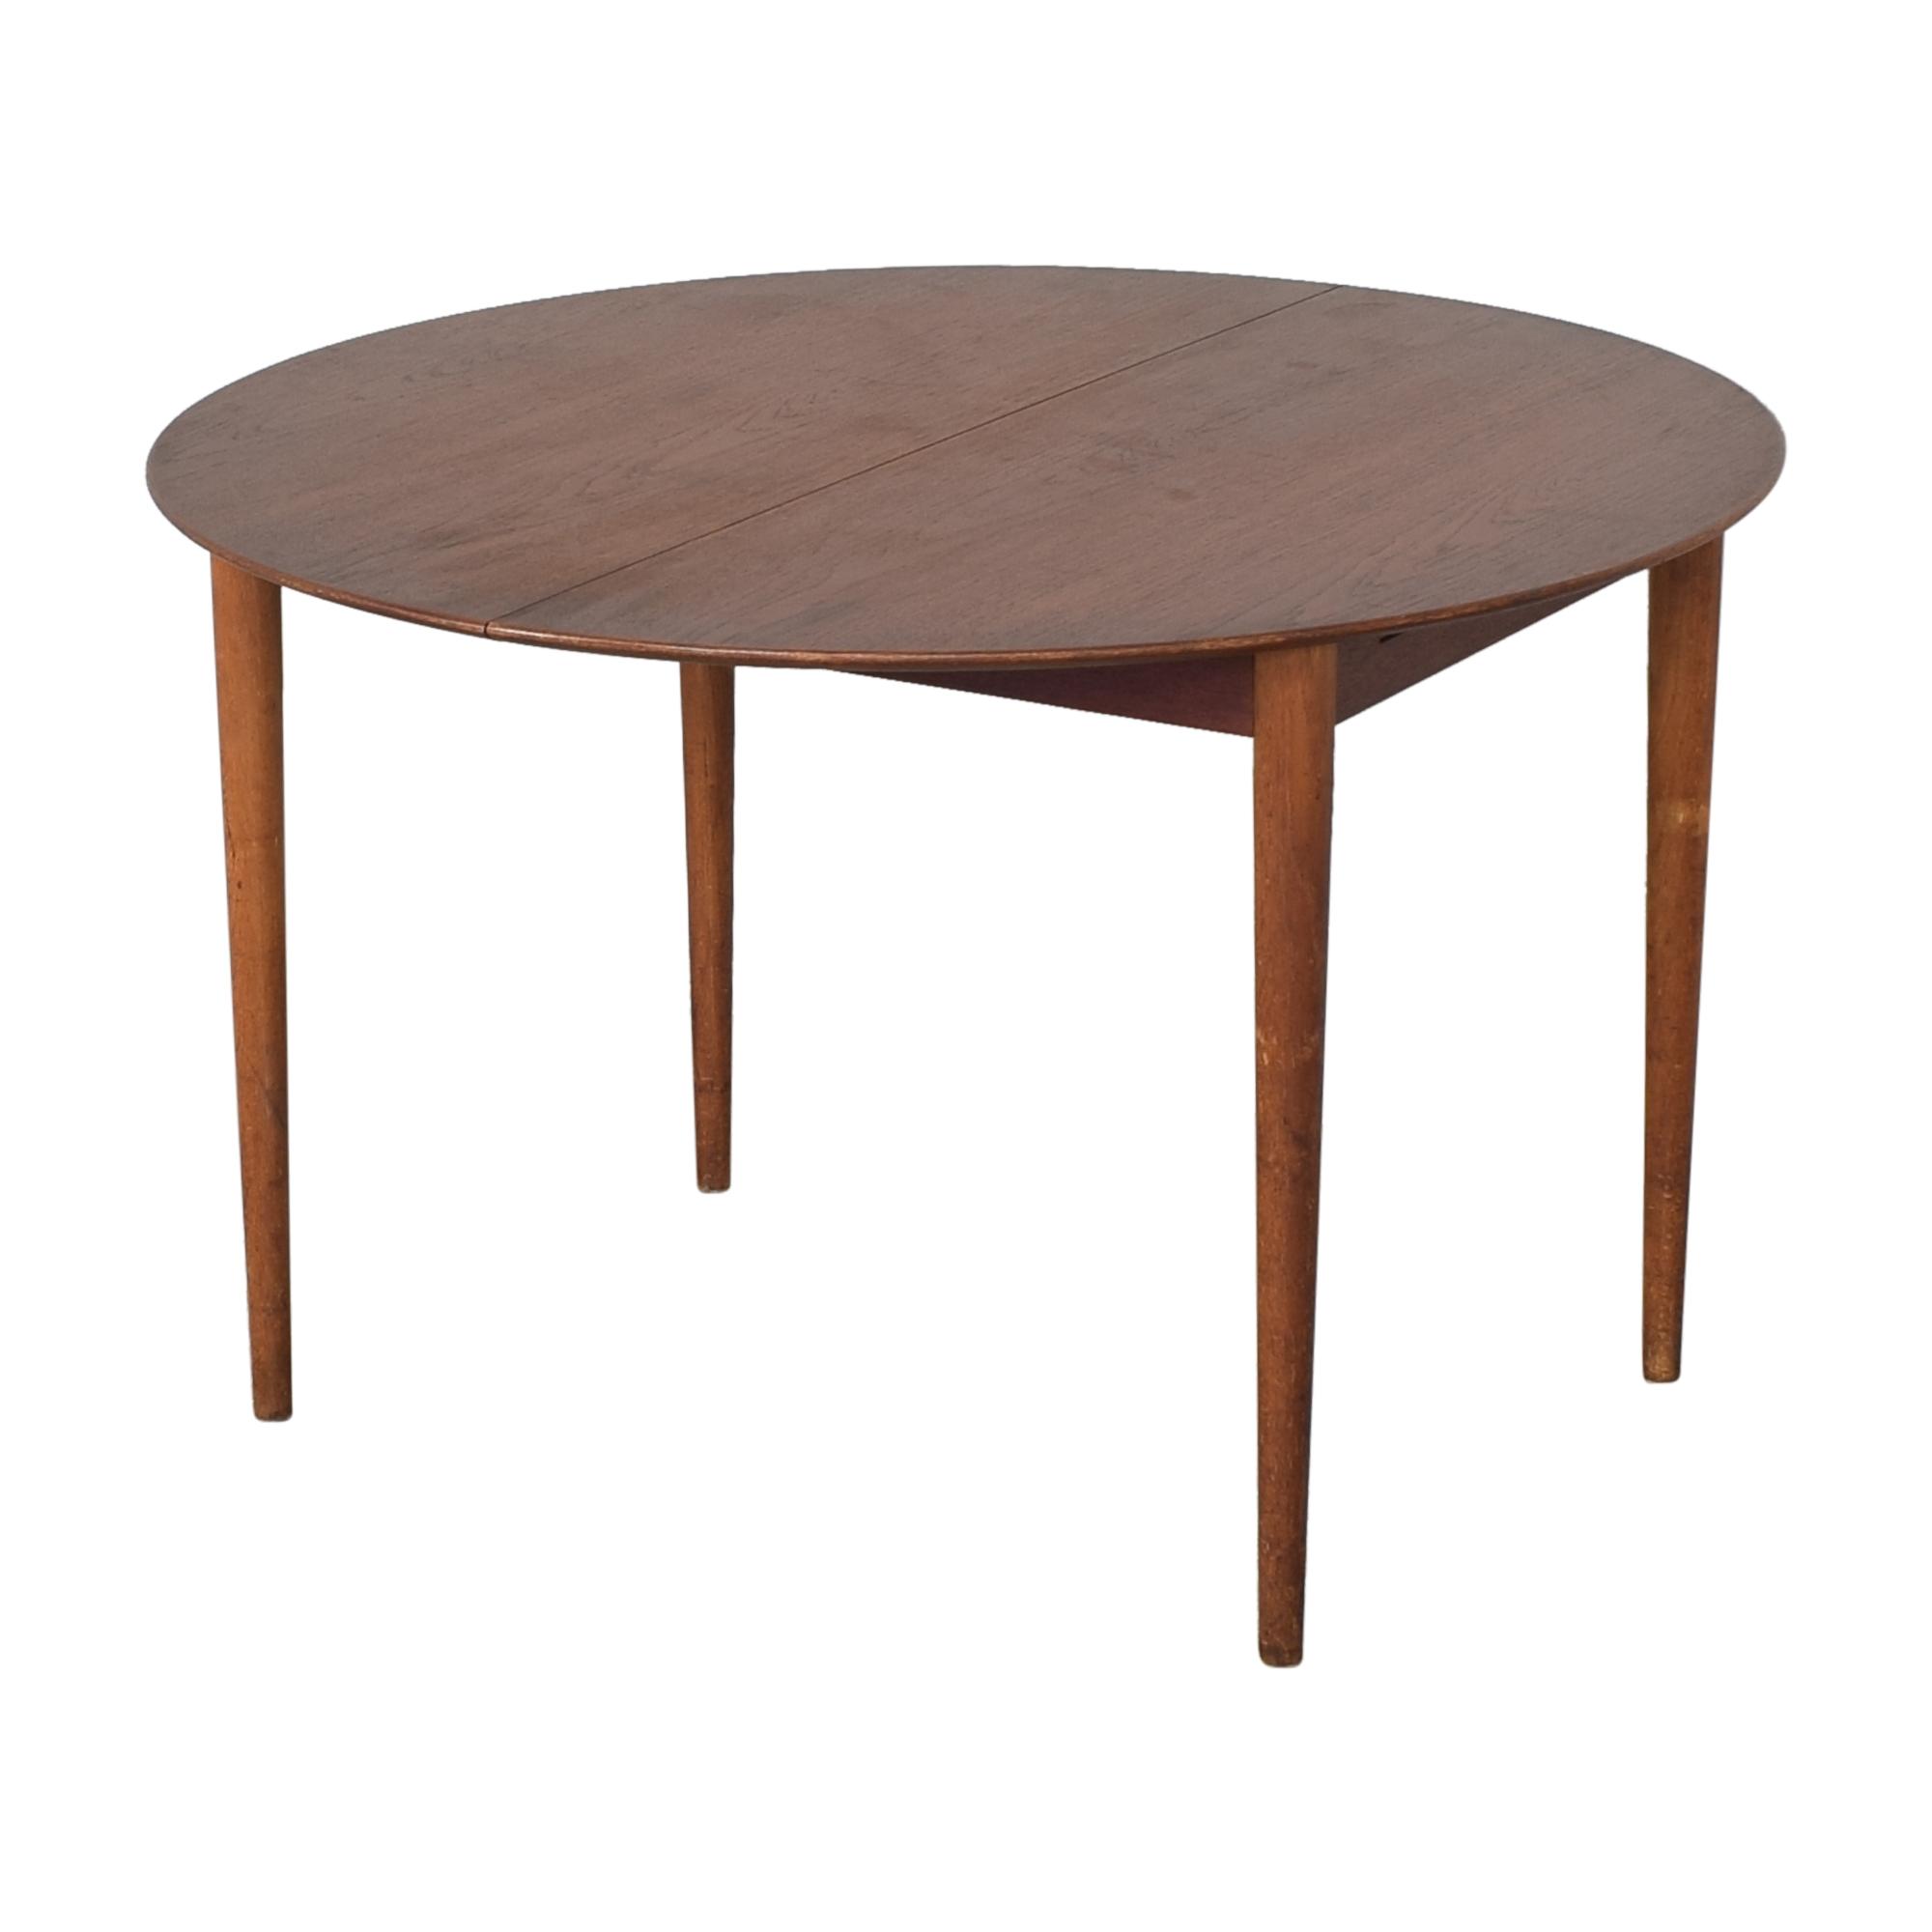 Søborg Møbelfabrik Soborg Mobelfabrik Mid Century Danish Extendable Dining Table  nj